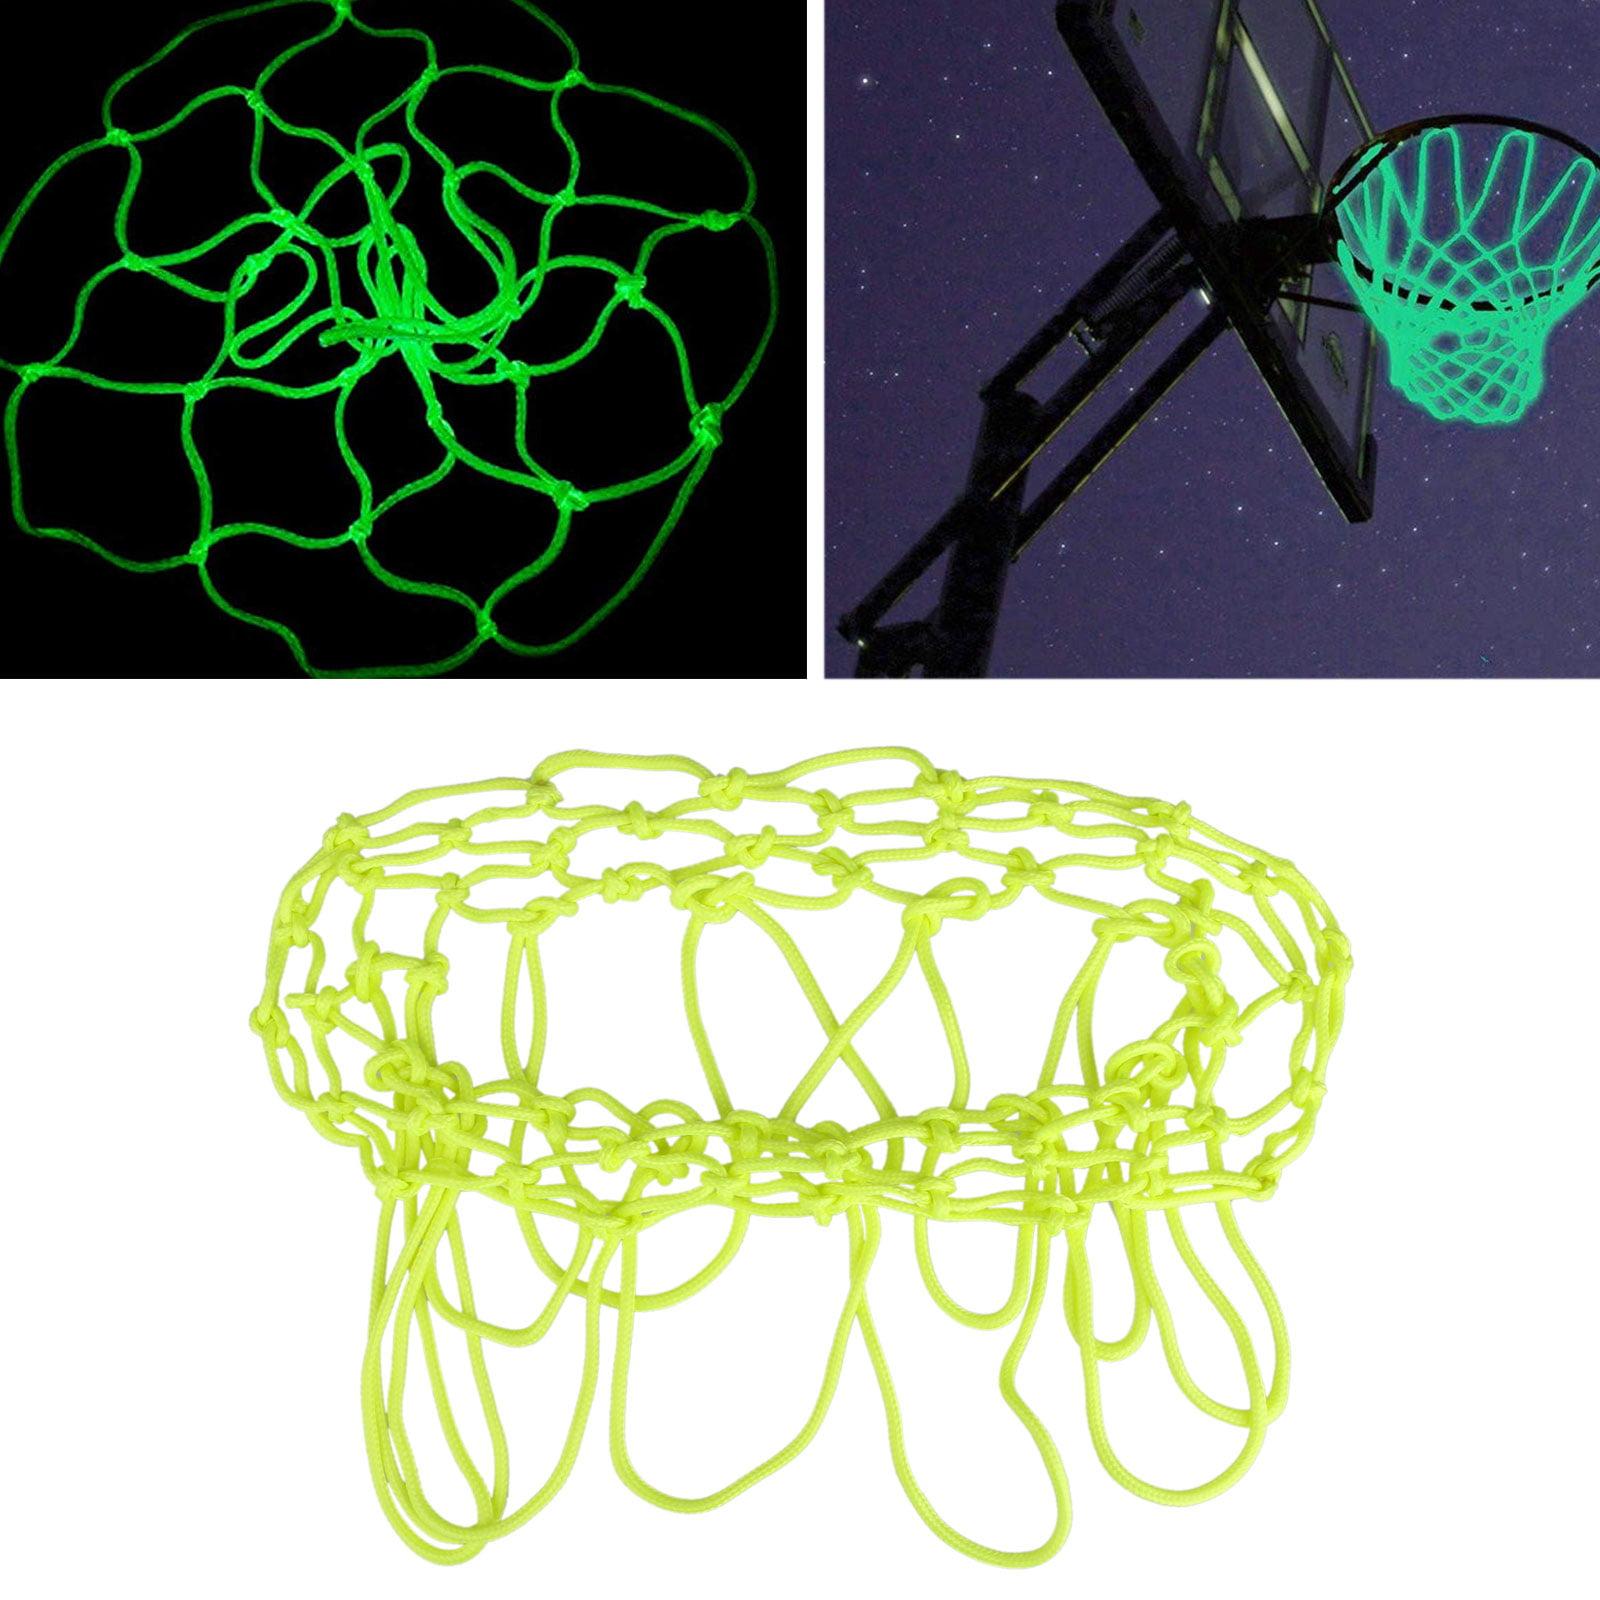 EEEkit Basketball Hoop Net Glow In The Dark Replacement, Fluorescent Green, fit for Luminous Shoot Training Sports Kid Gift